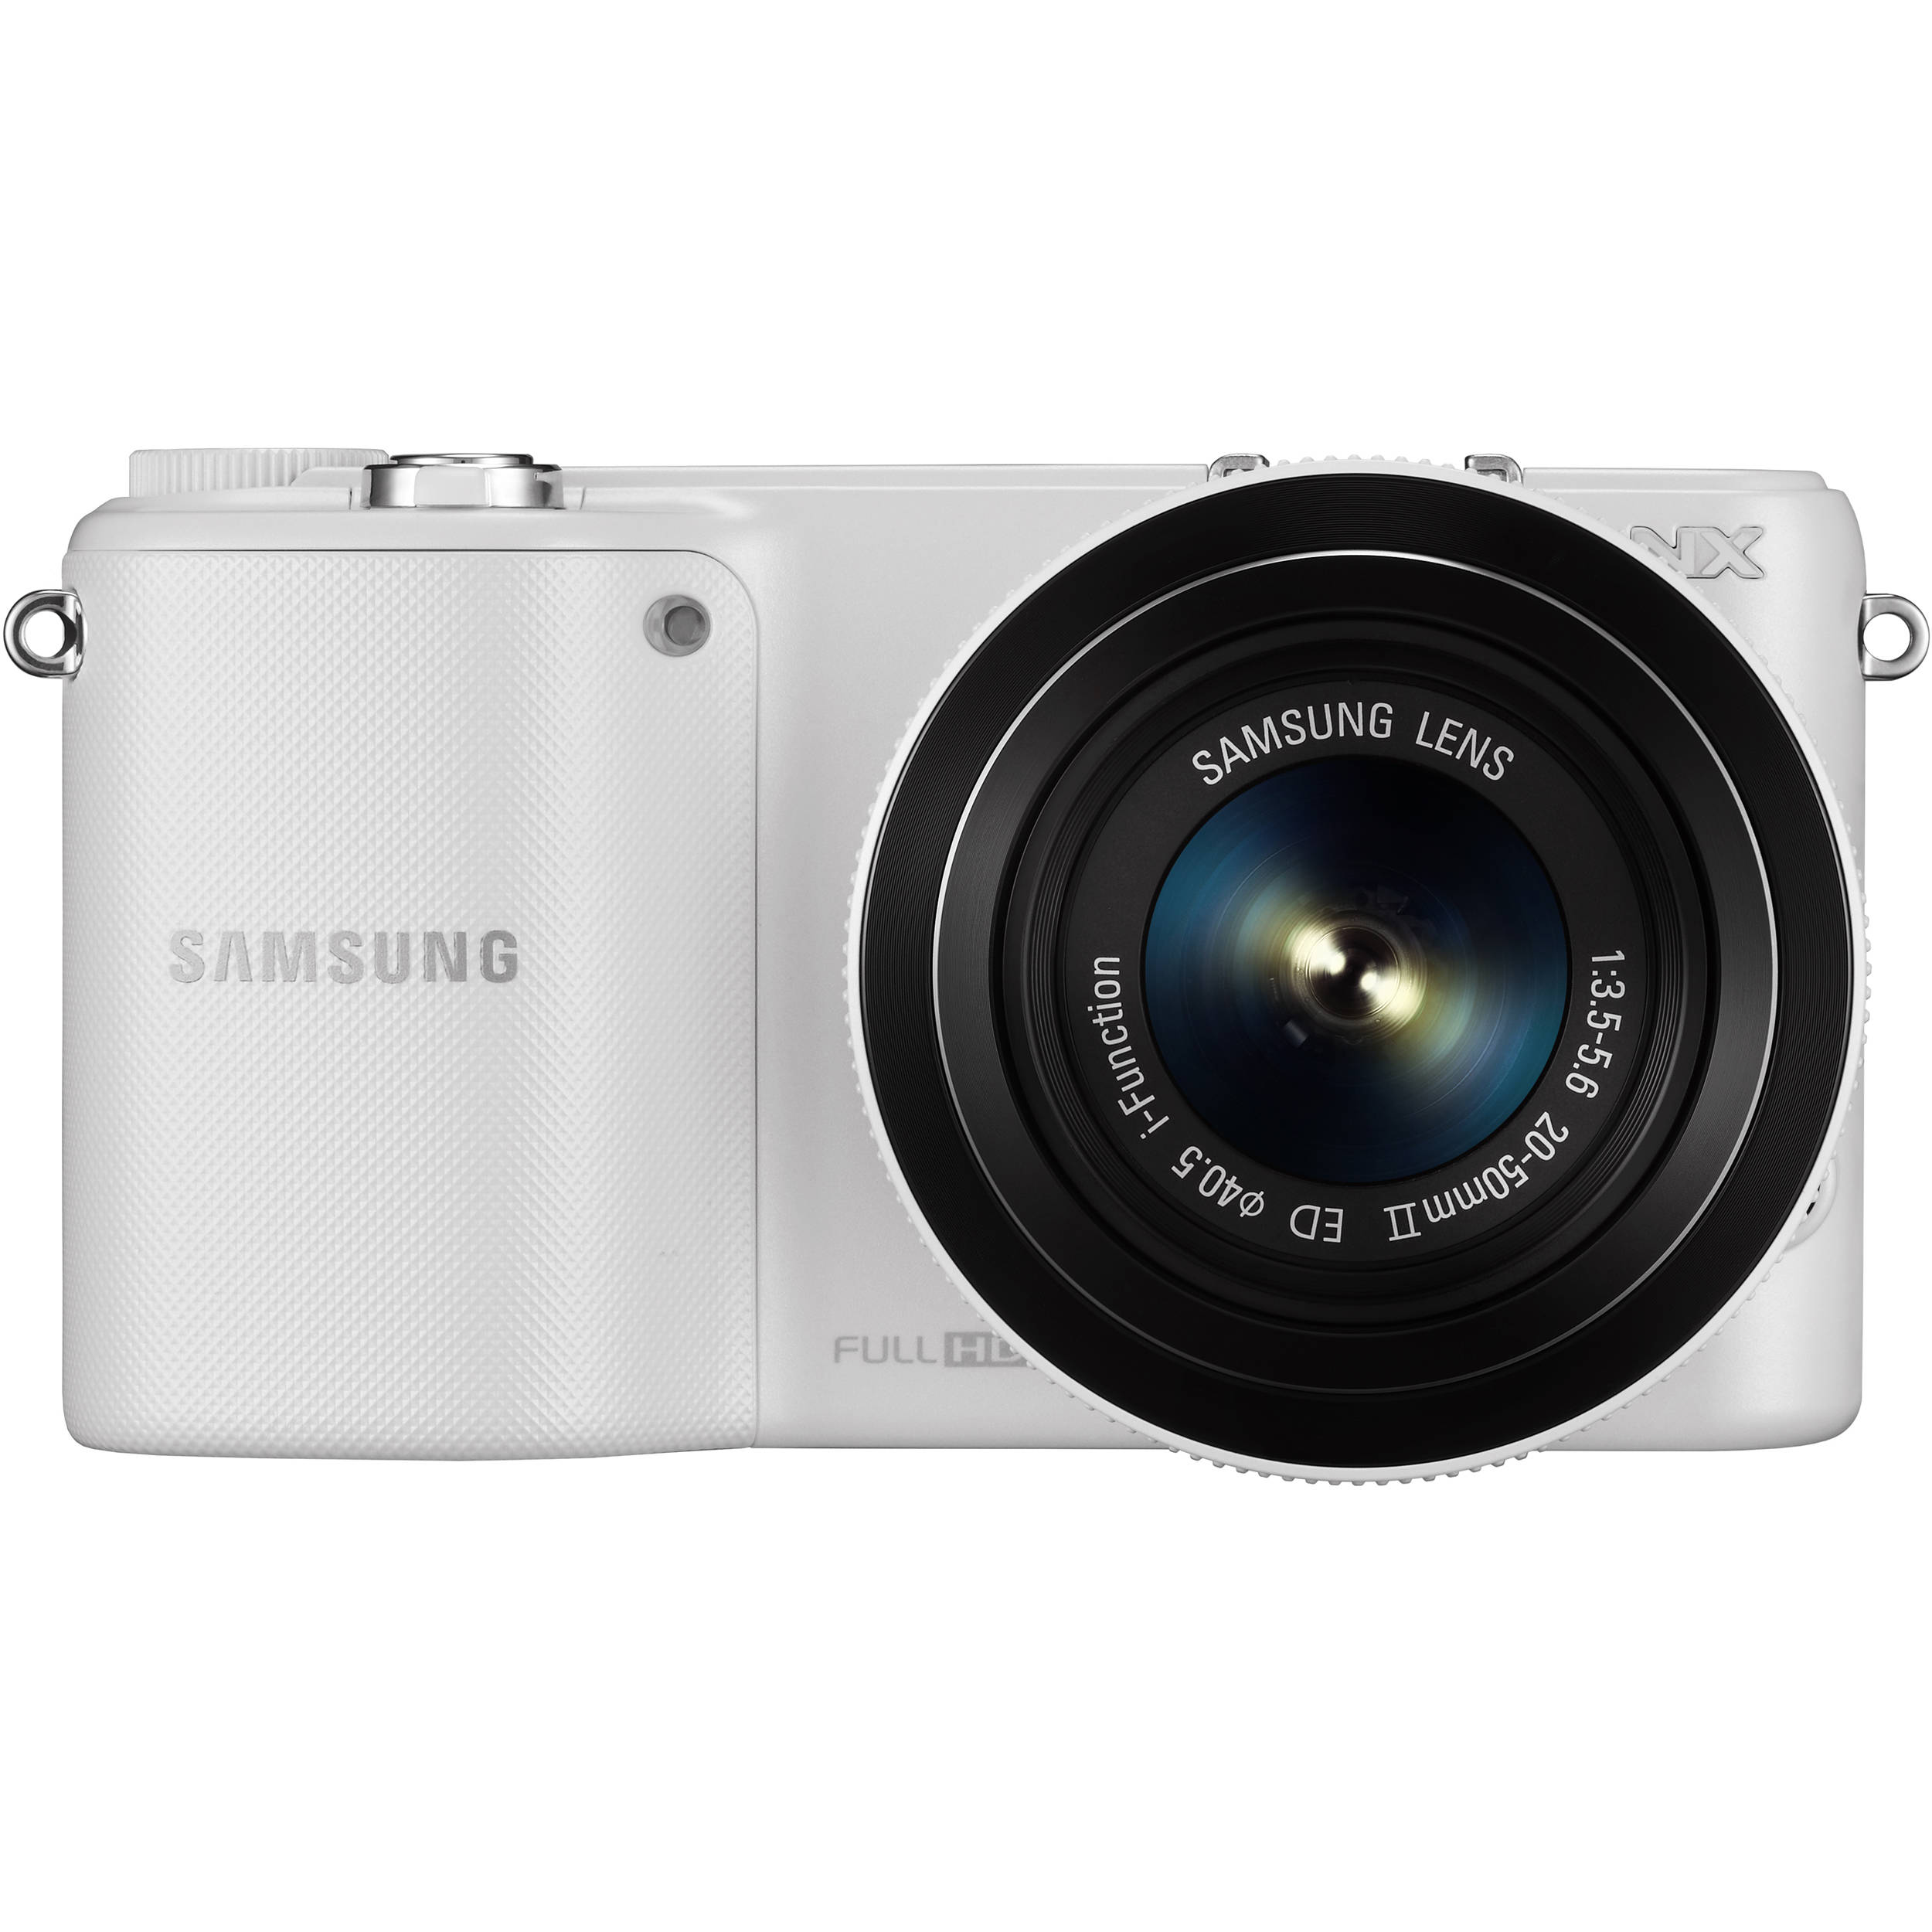 Samsung NX2000 Mirrorless Digital Camera EV-NX2000BFWUS B&H